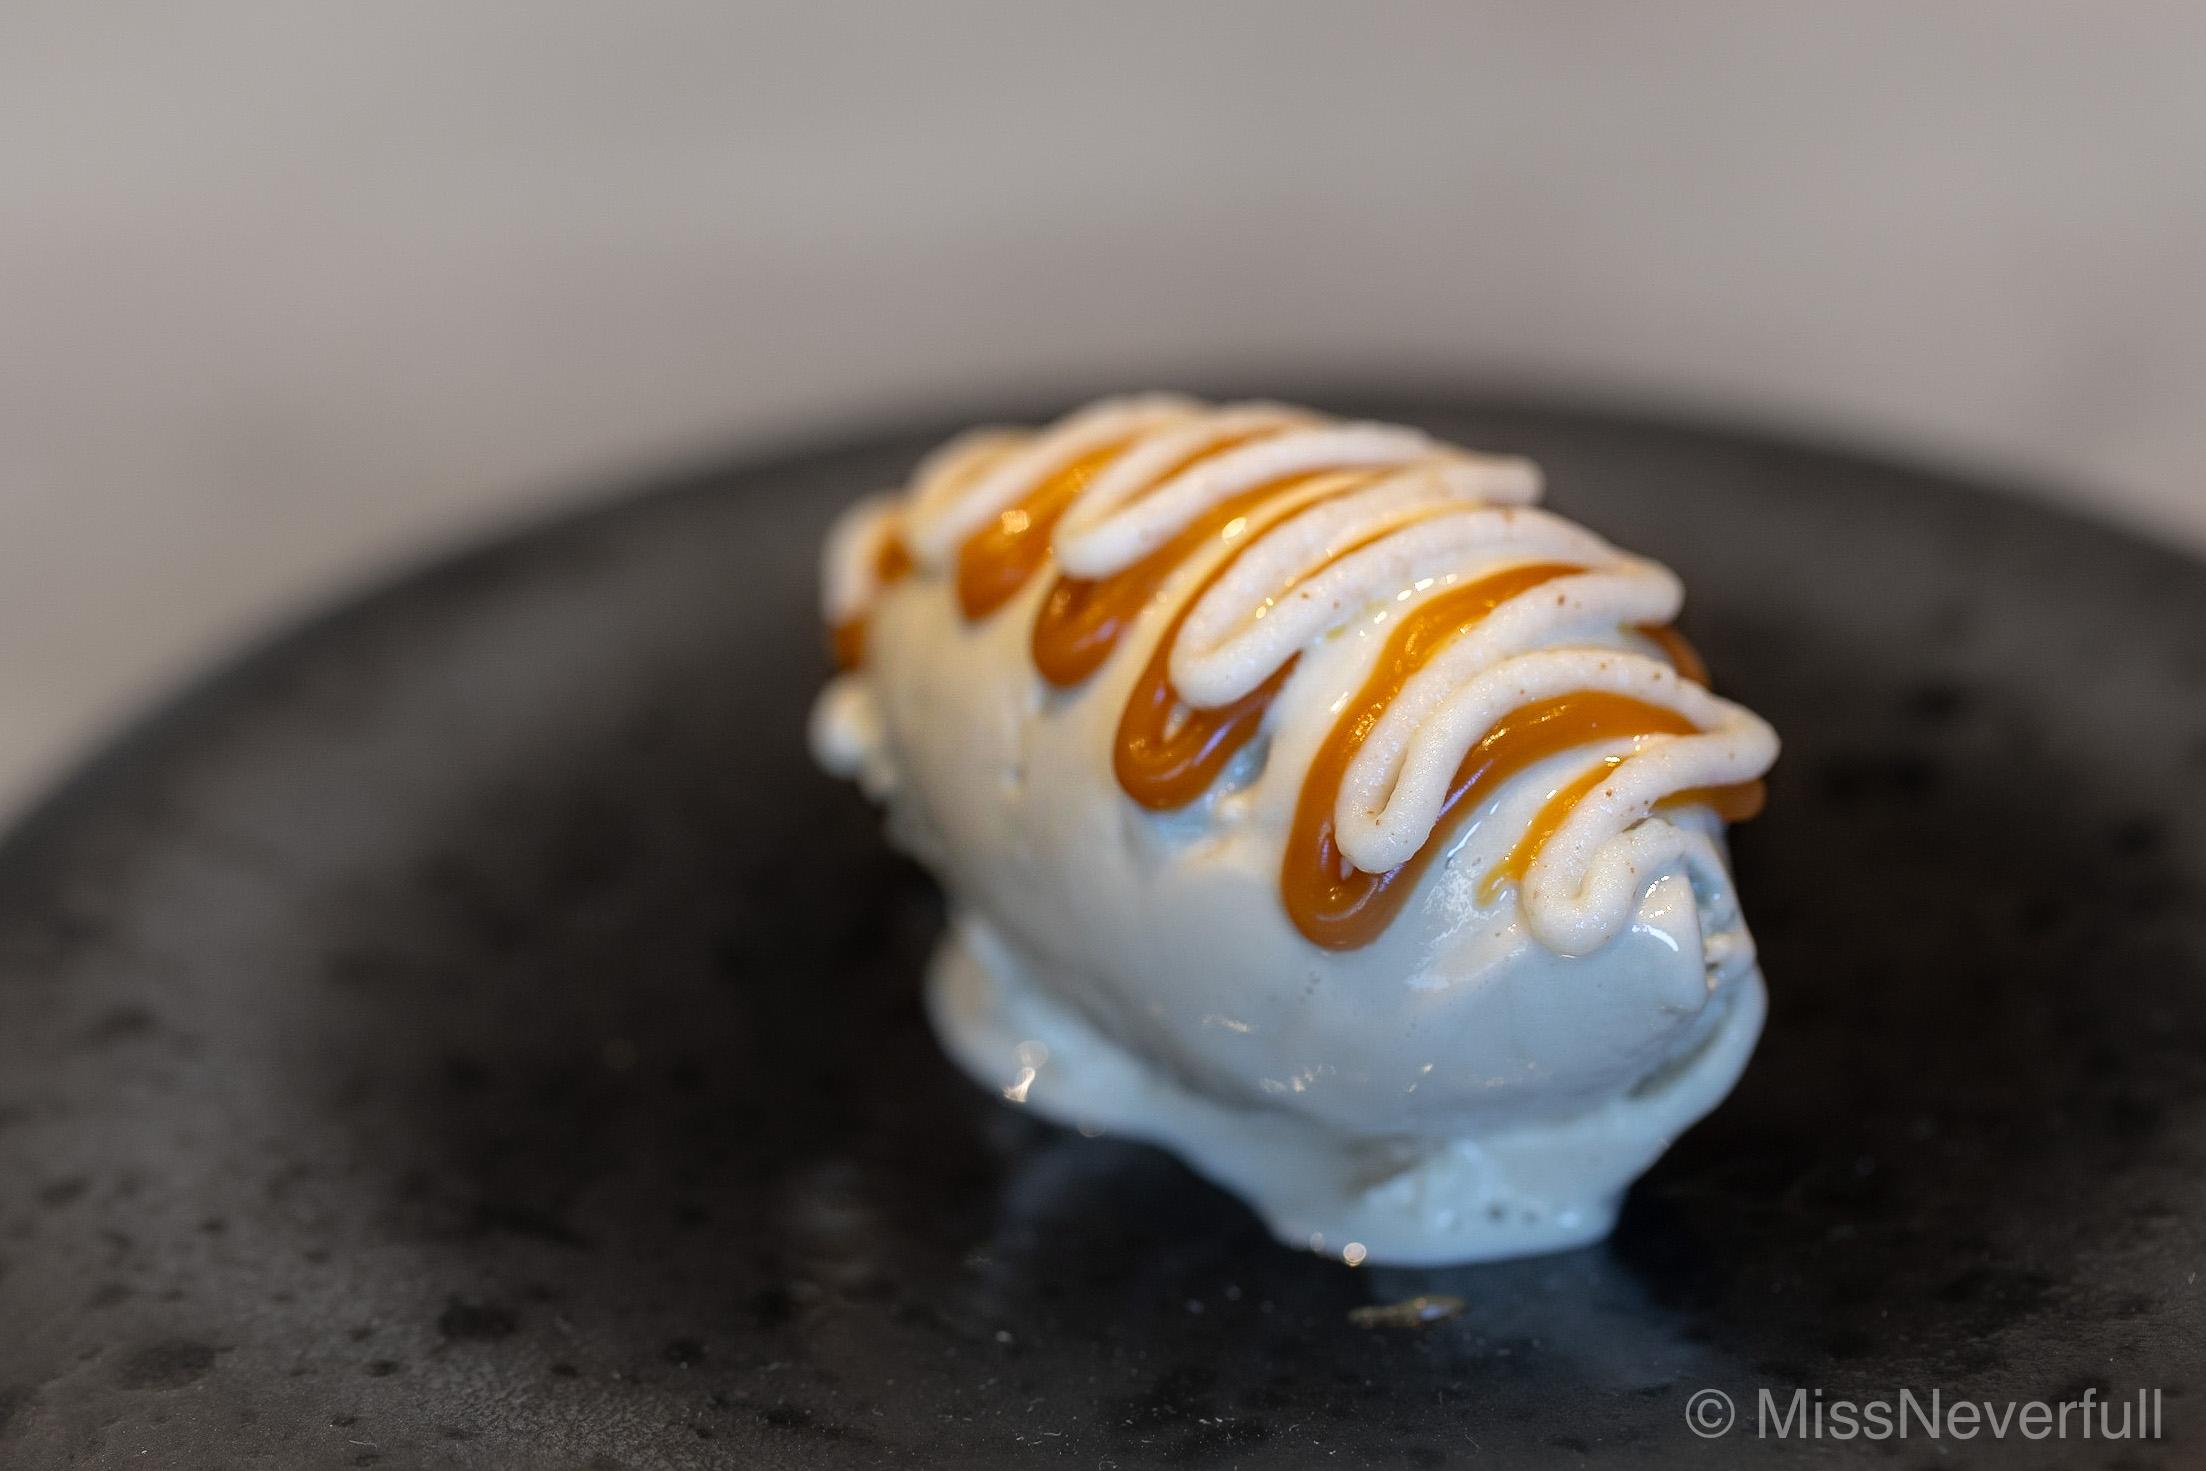 7. Fukinoto Ice cream and caramel sauce